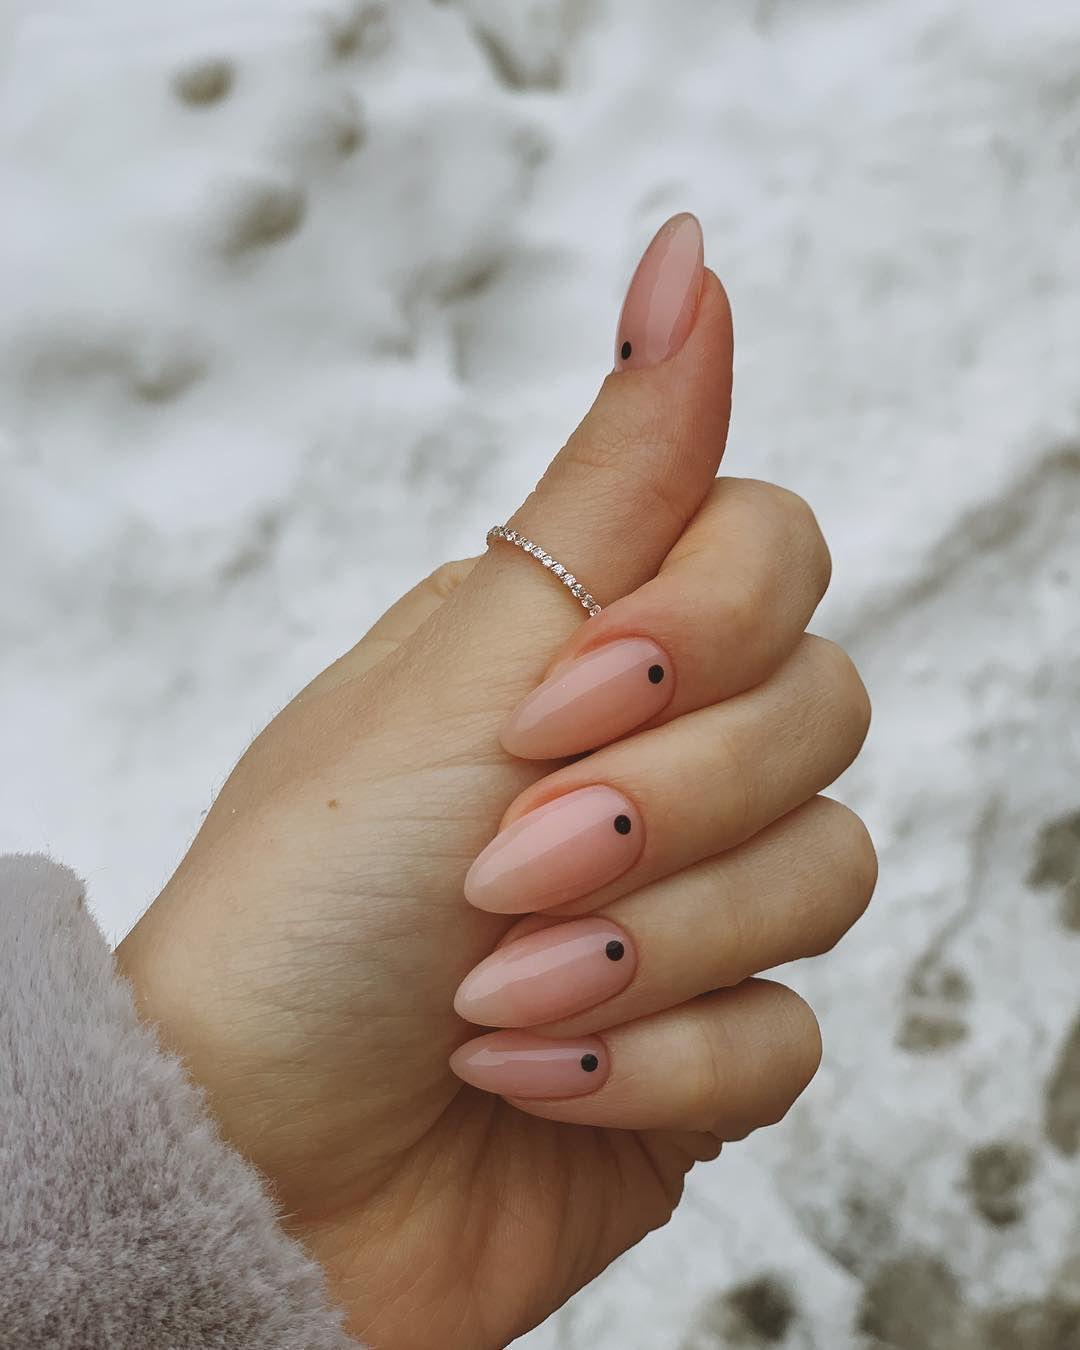 #almond Nails #nageldesigns almond